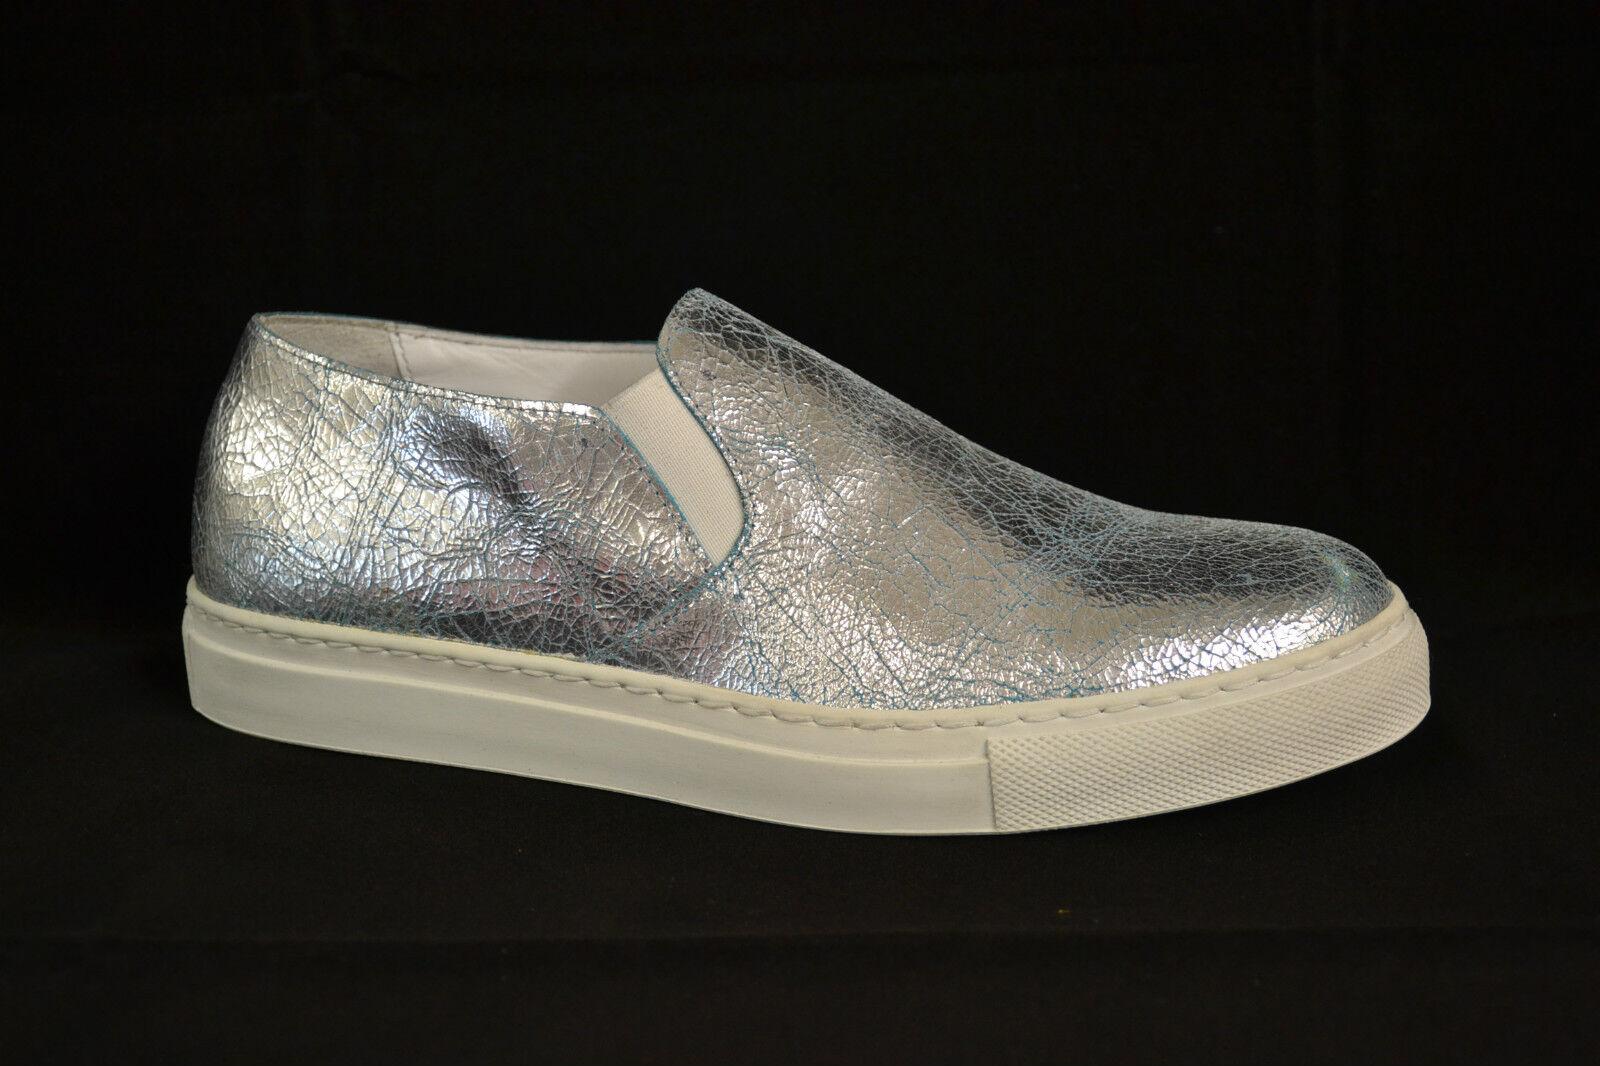 Pelle Vera Artigianali Sneakers In Scarpe Made Argento SwqU88zT